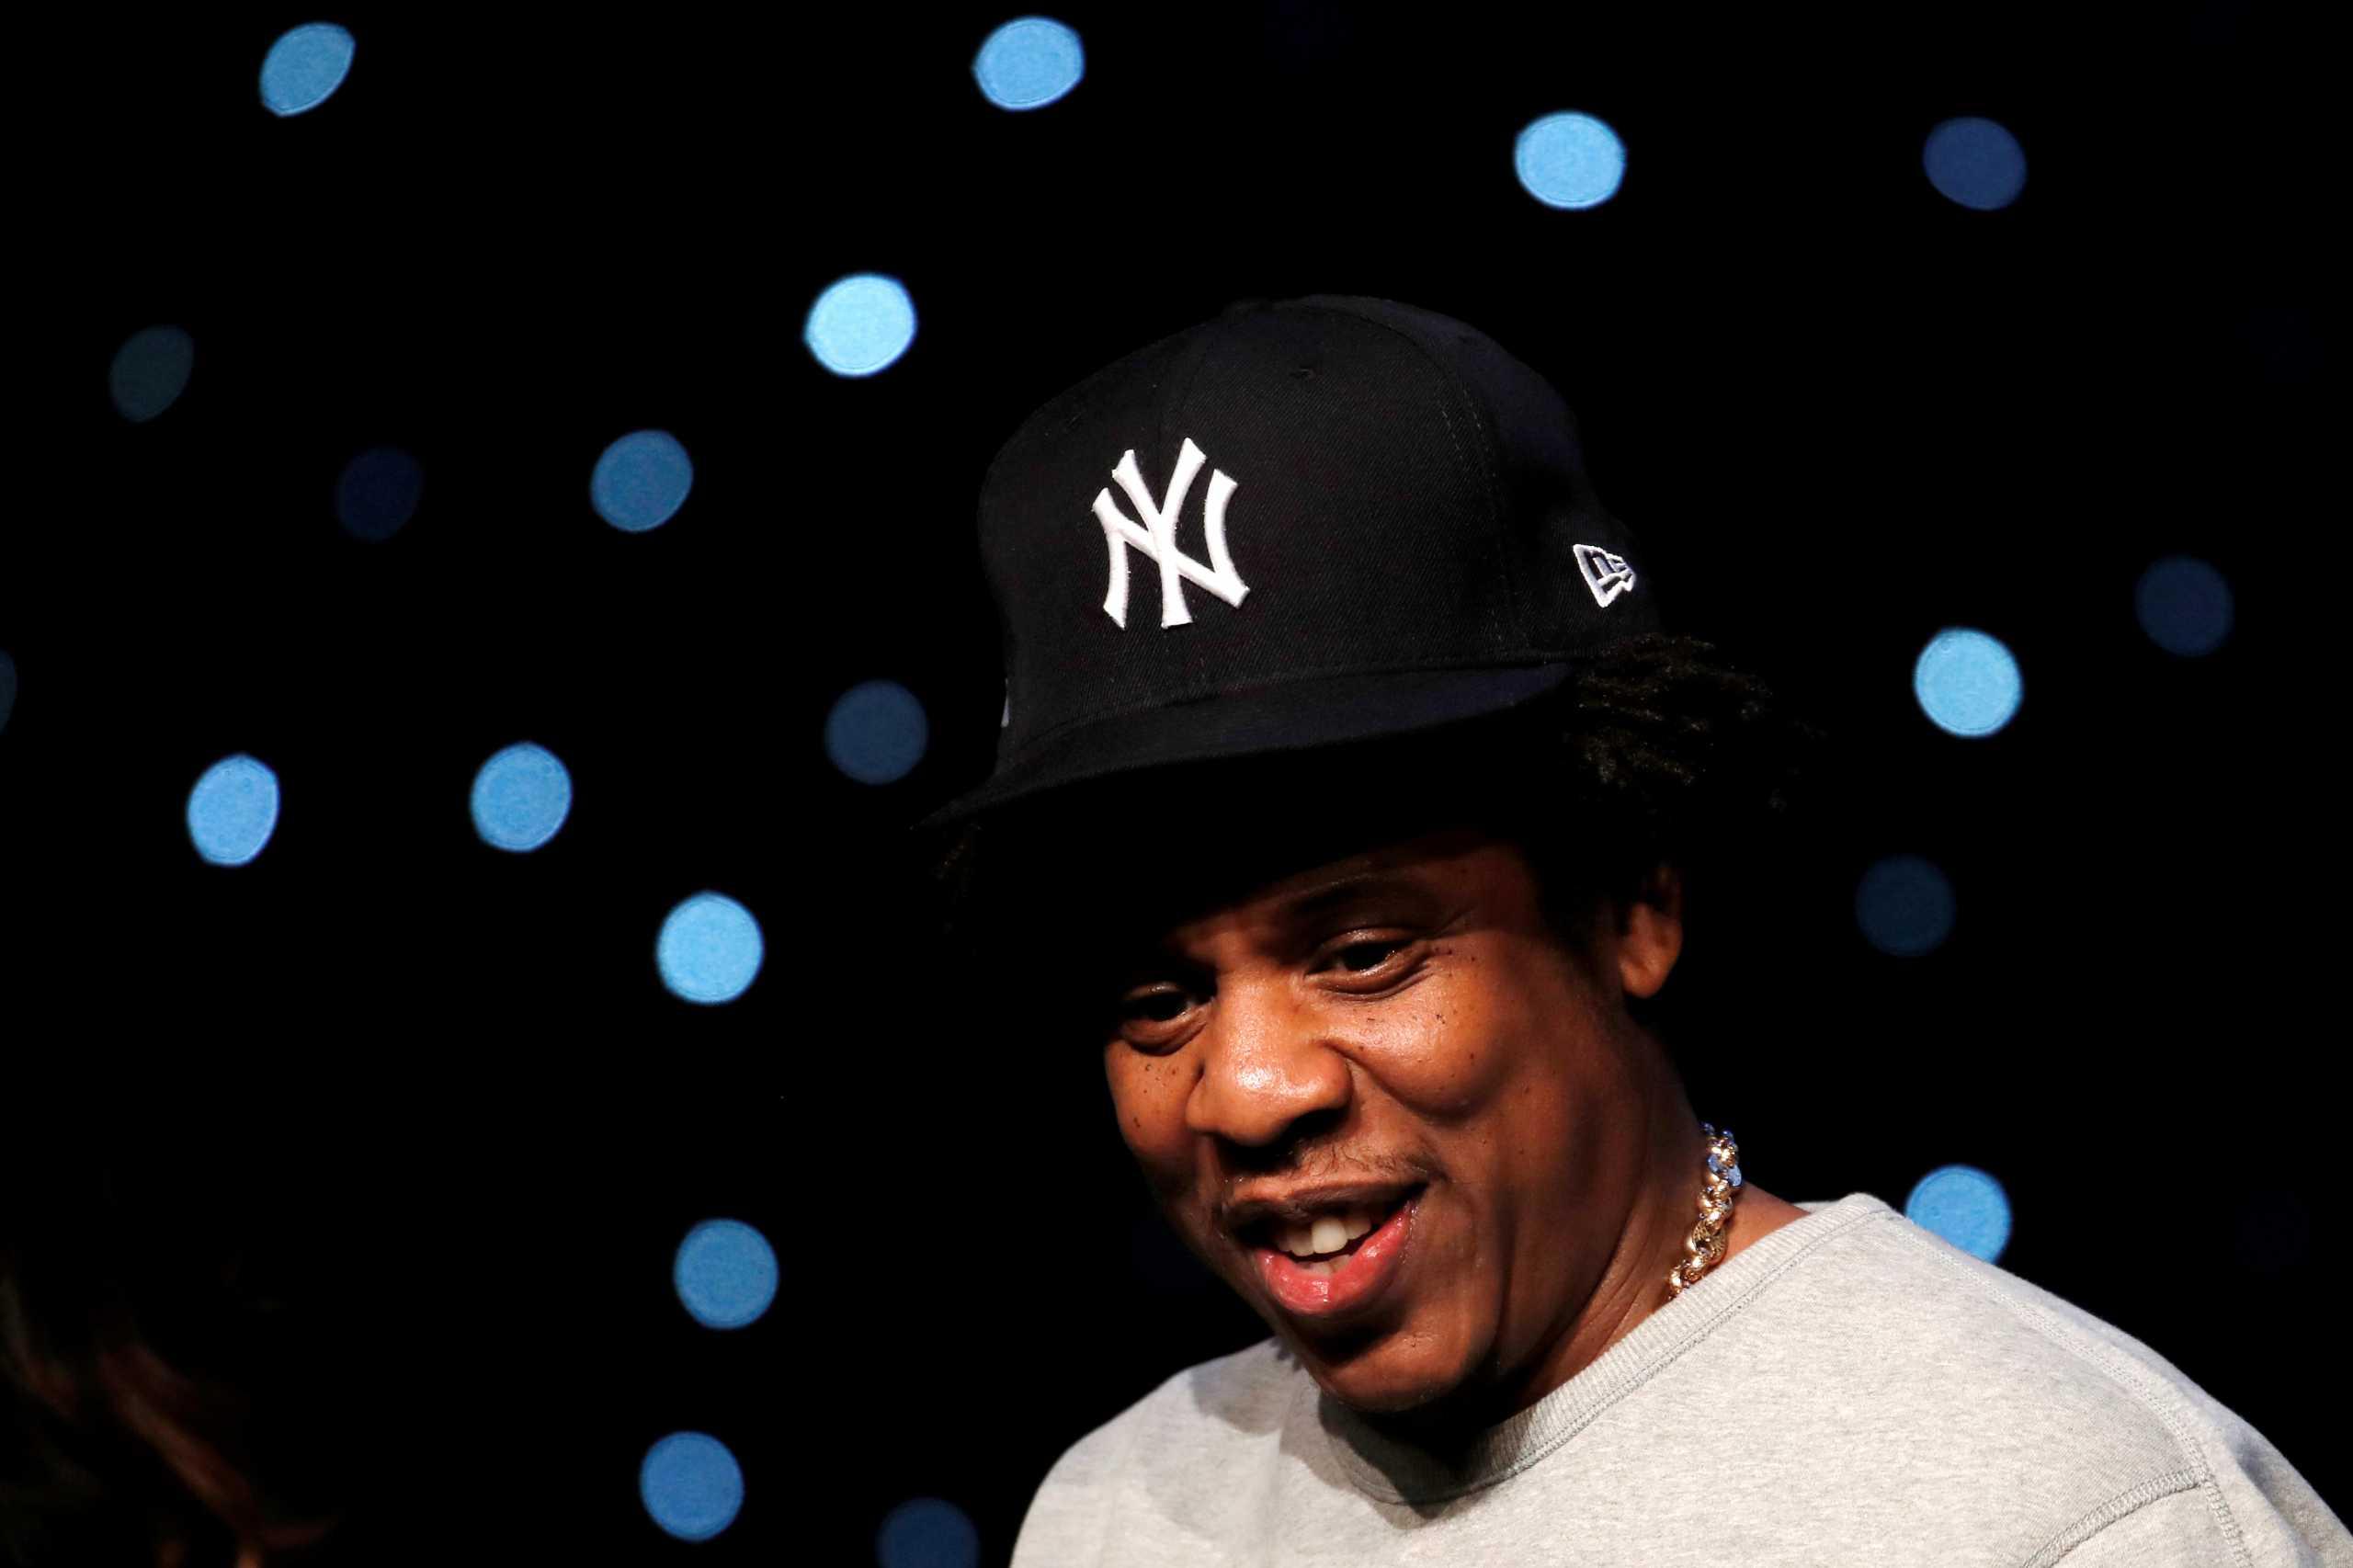 Jay-Z: Θέλω να με θυμούνται όπως τον Μπομπ Μάρλεϊ και όλους τους μεγάλους